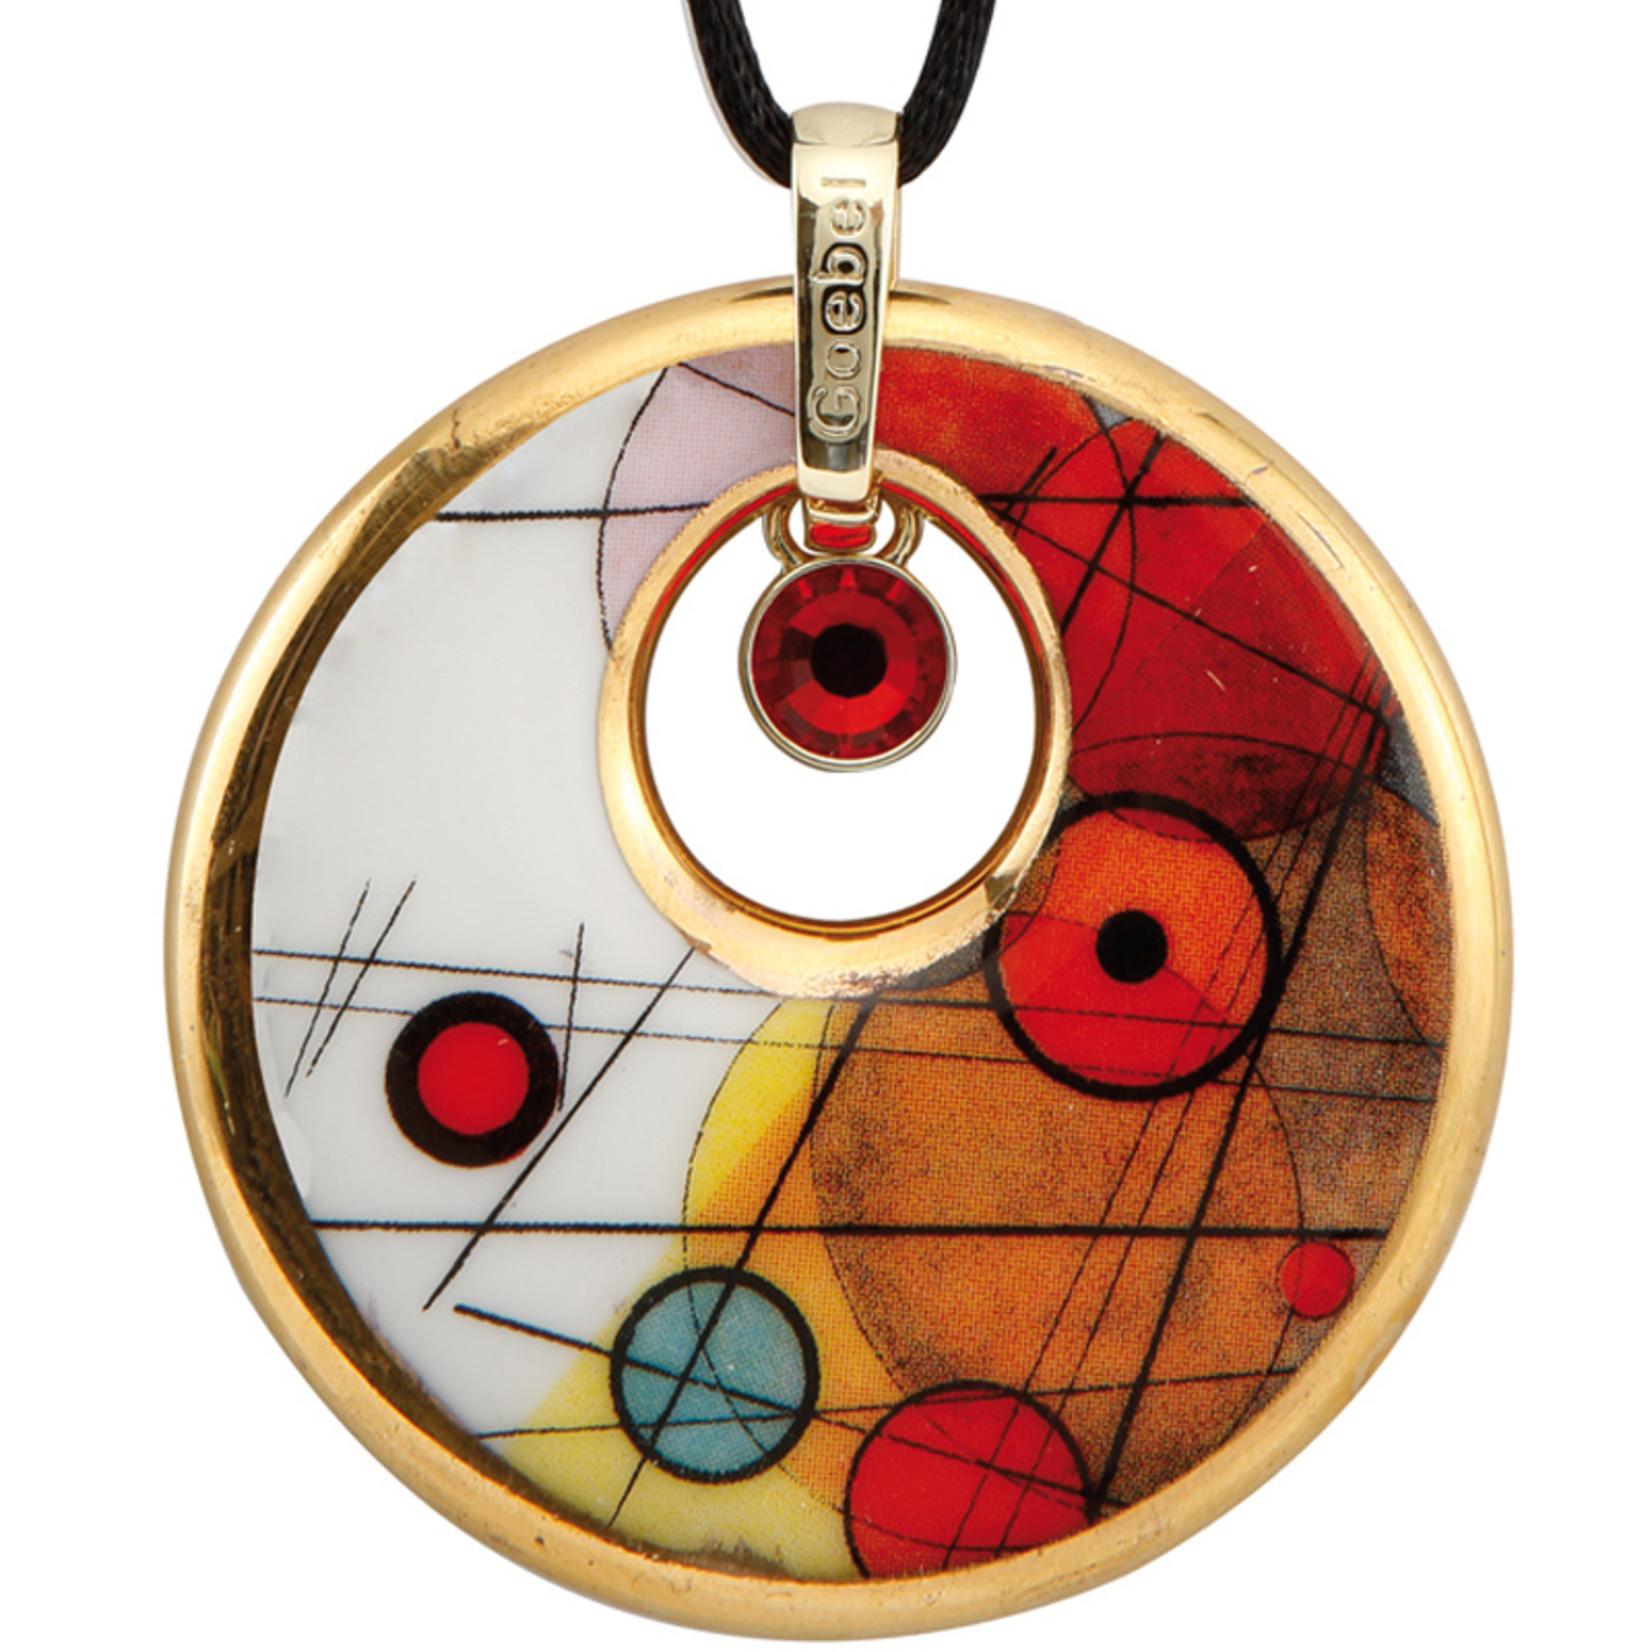 Goebel Porzellanmanufaktur Kette Kreise im Kreis I Goebel Porzellan I Wassily Kandinsky